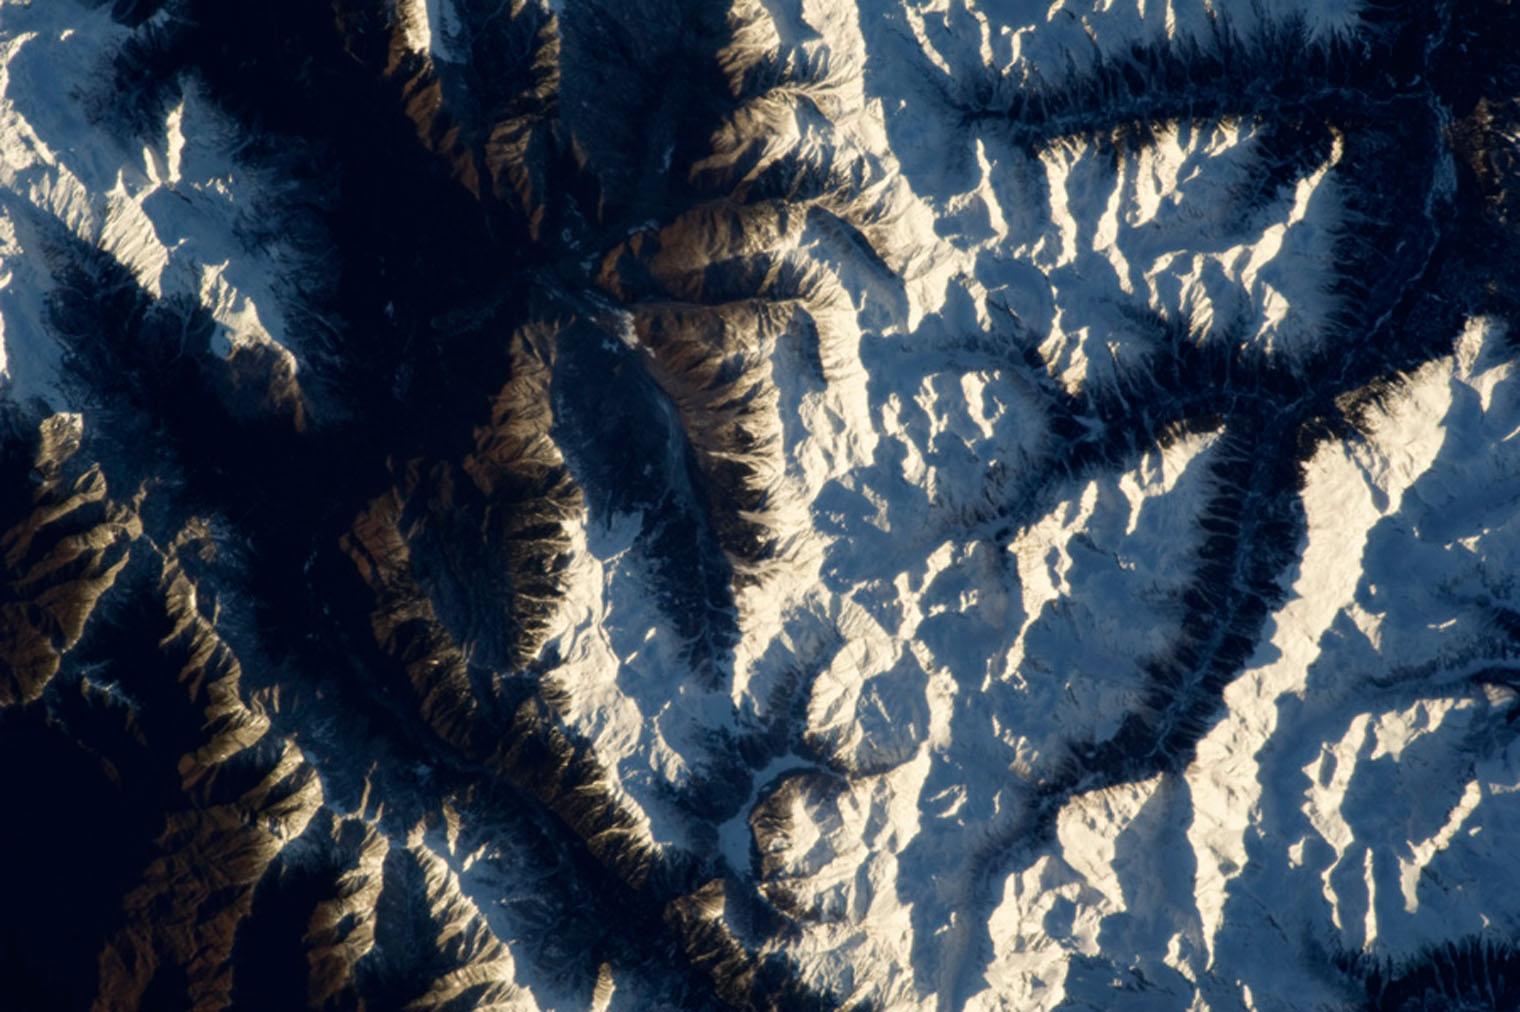 Mountains near Sochi, Russia